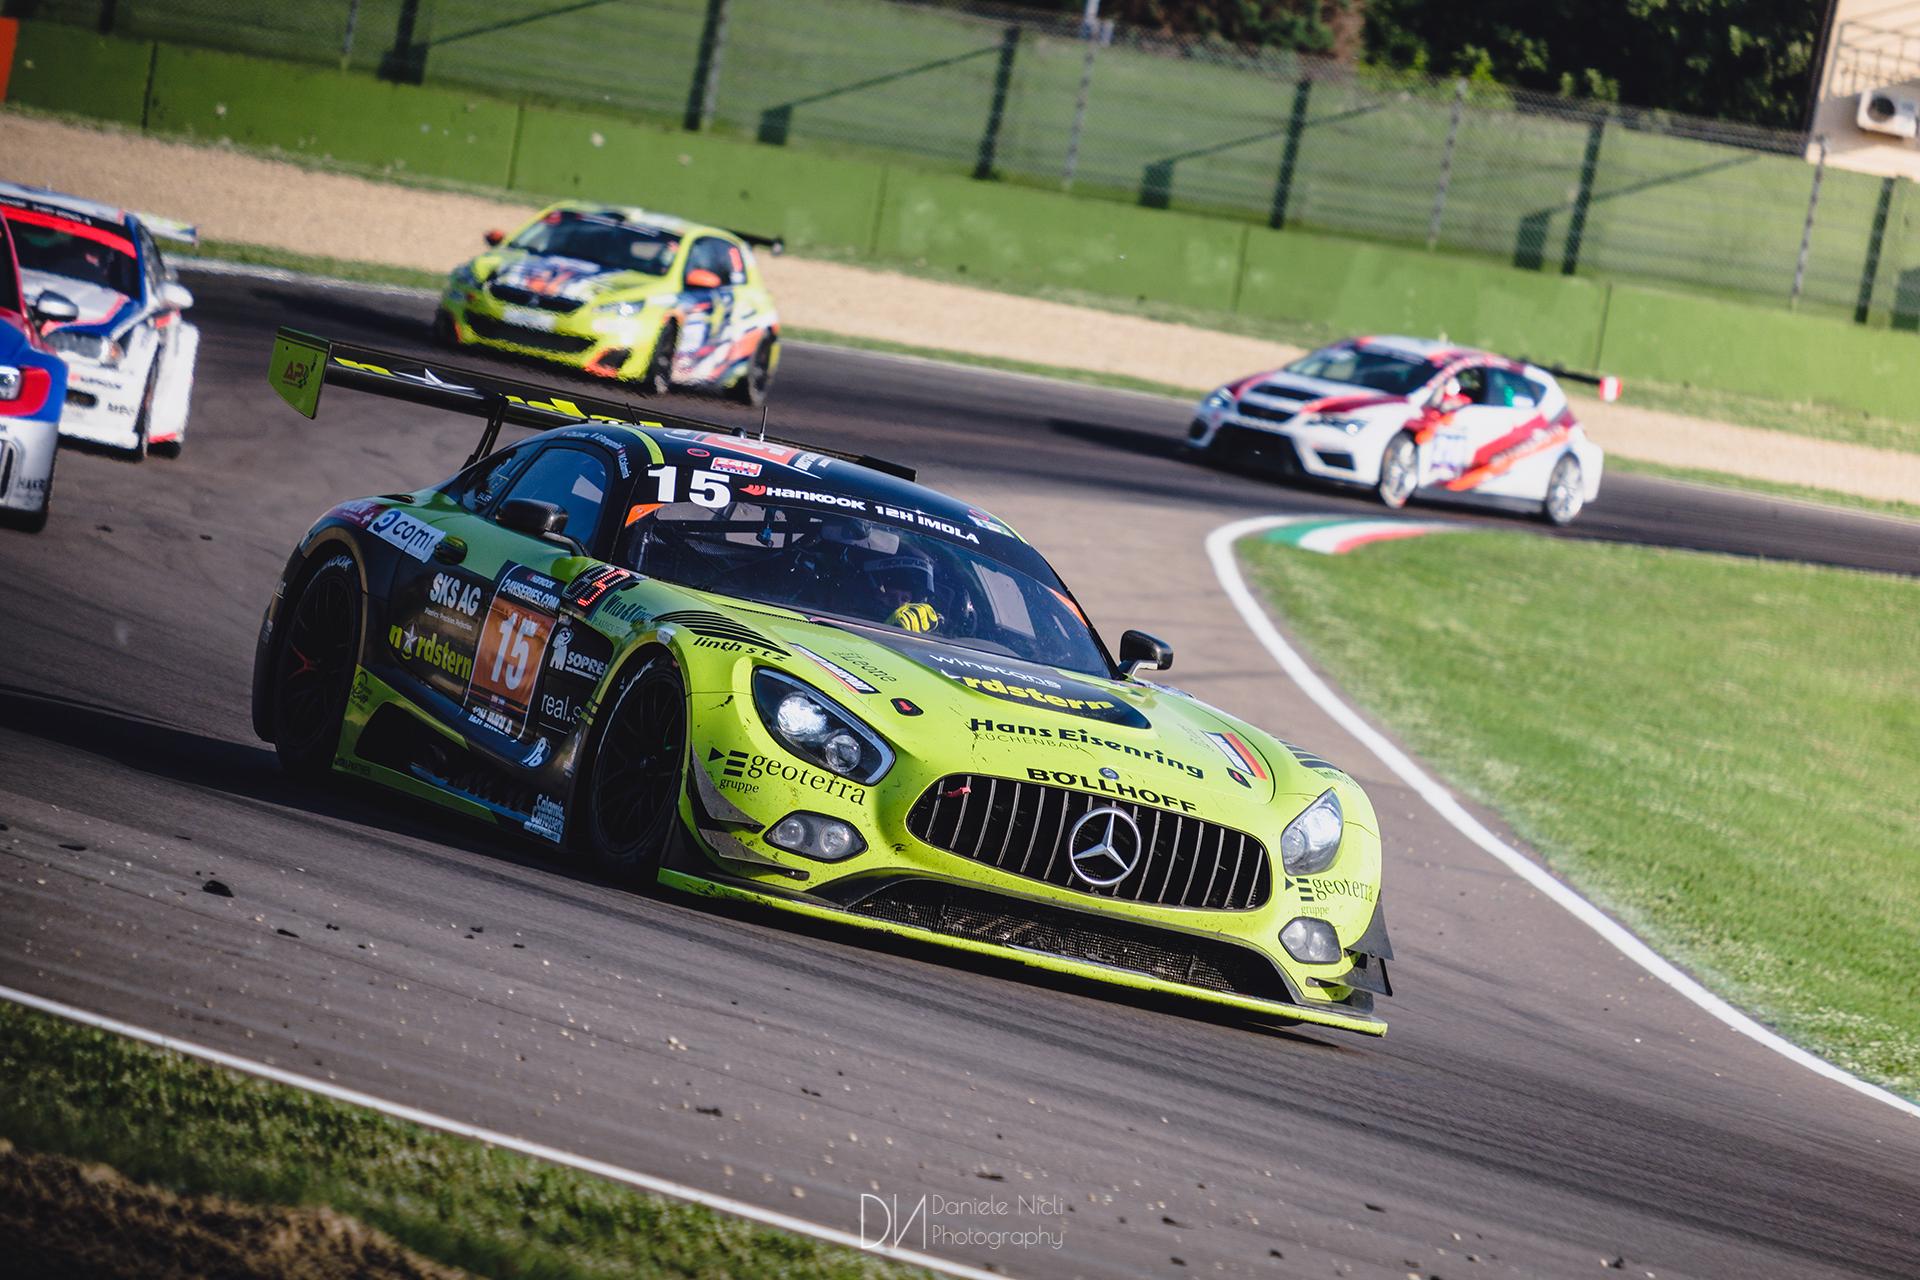 Mercedes-AMG GT3 12H Imola...